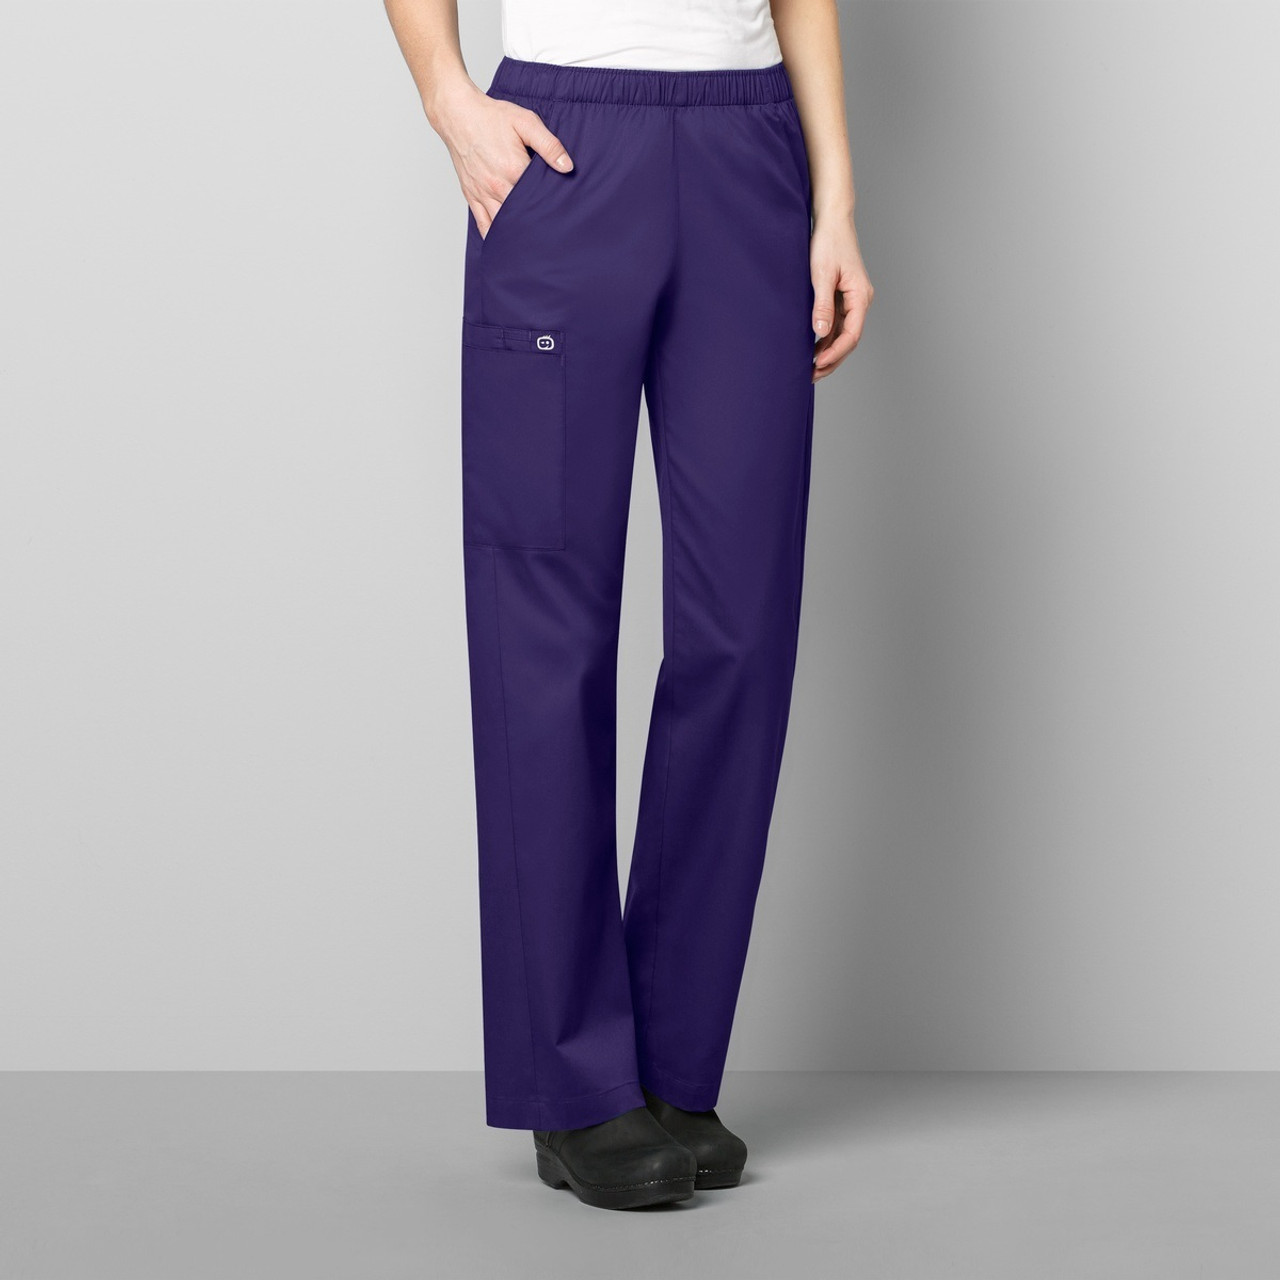 1b5de394180 501P WonderWink WonderWORK Women's Elastic Waist Pant Petite | Jens ...